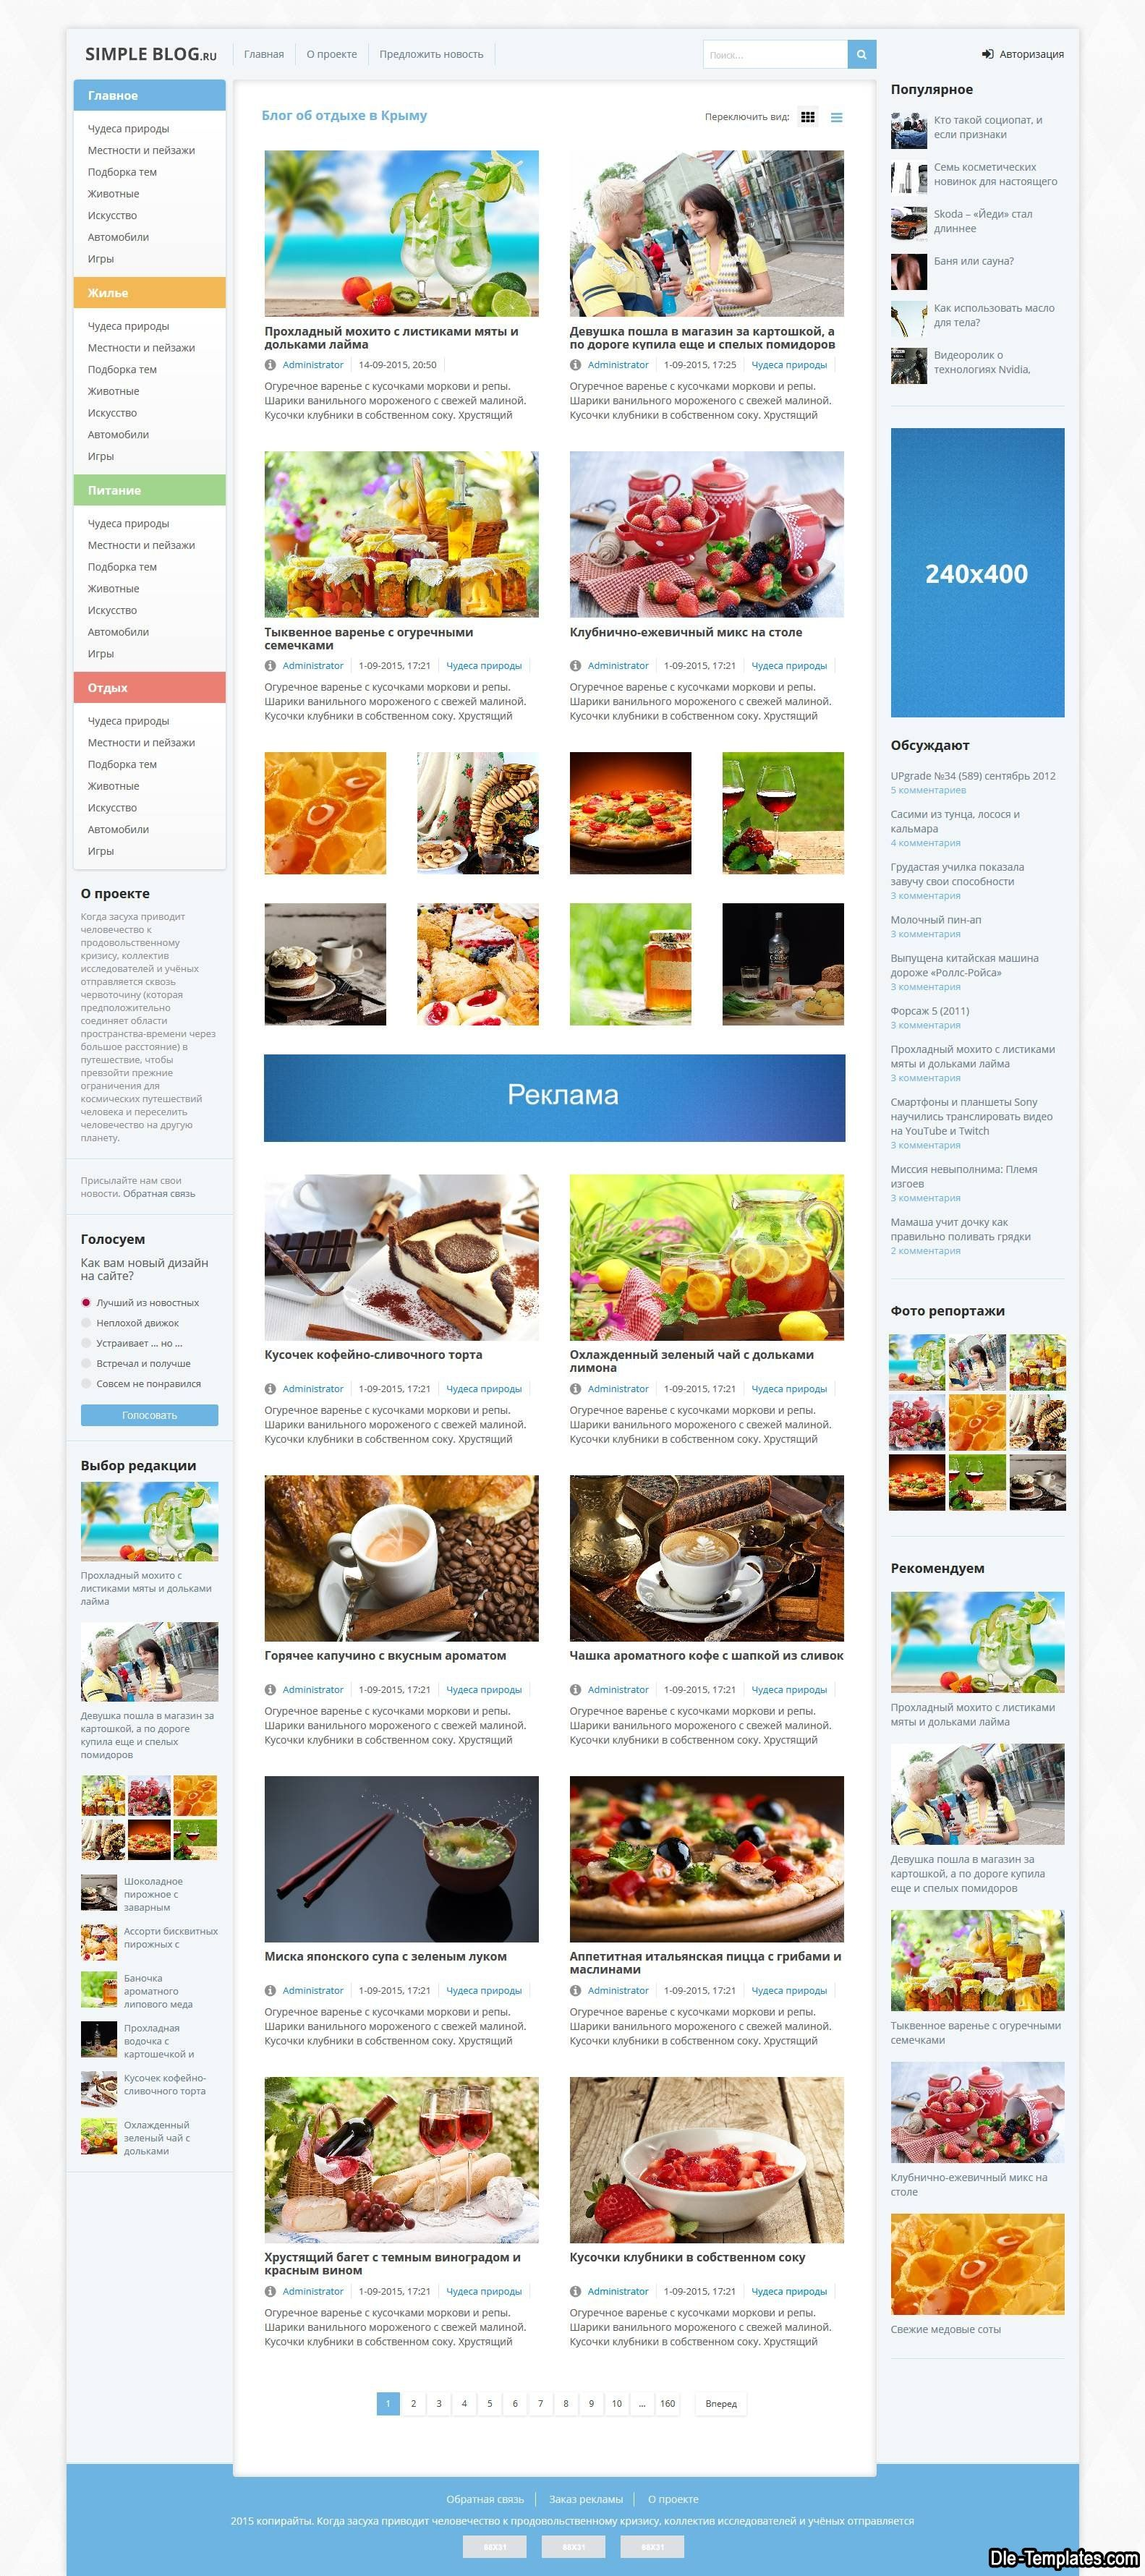 Simple Blog v2 - адаптивный блоговый шаблон для DLE